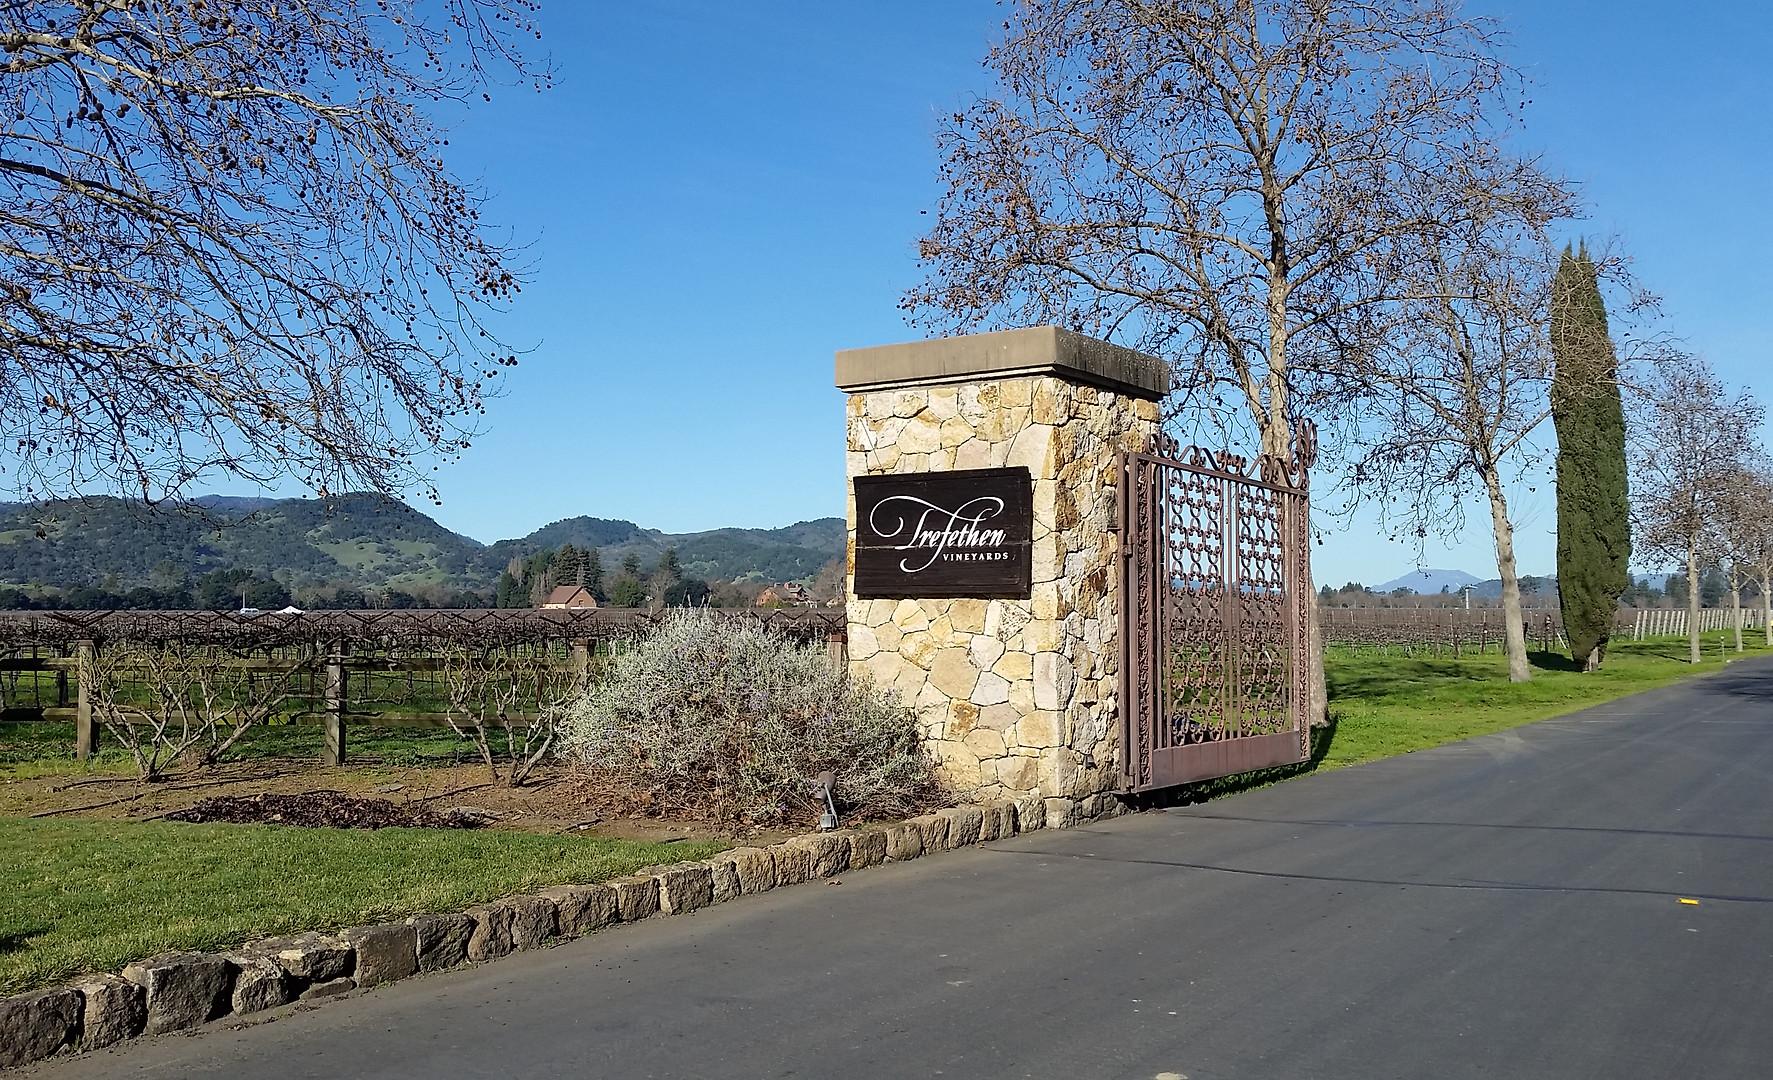 Trefethen Winery (Napa Valley, Californi